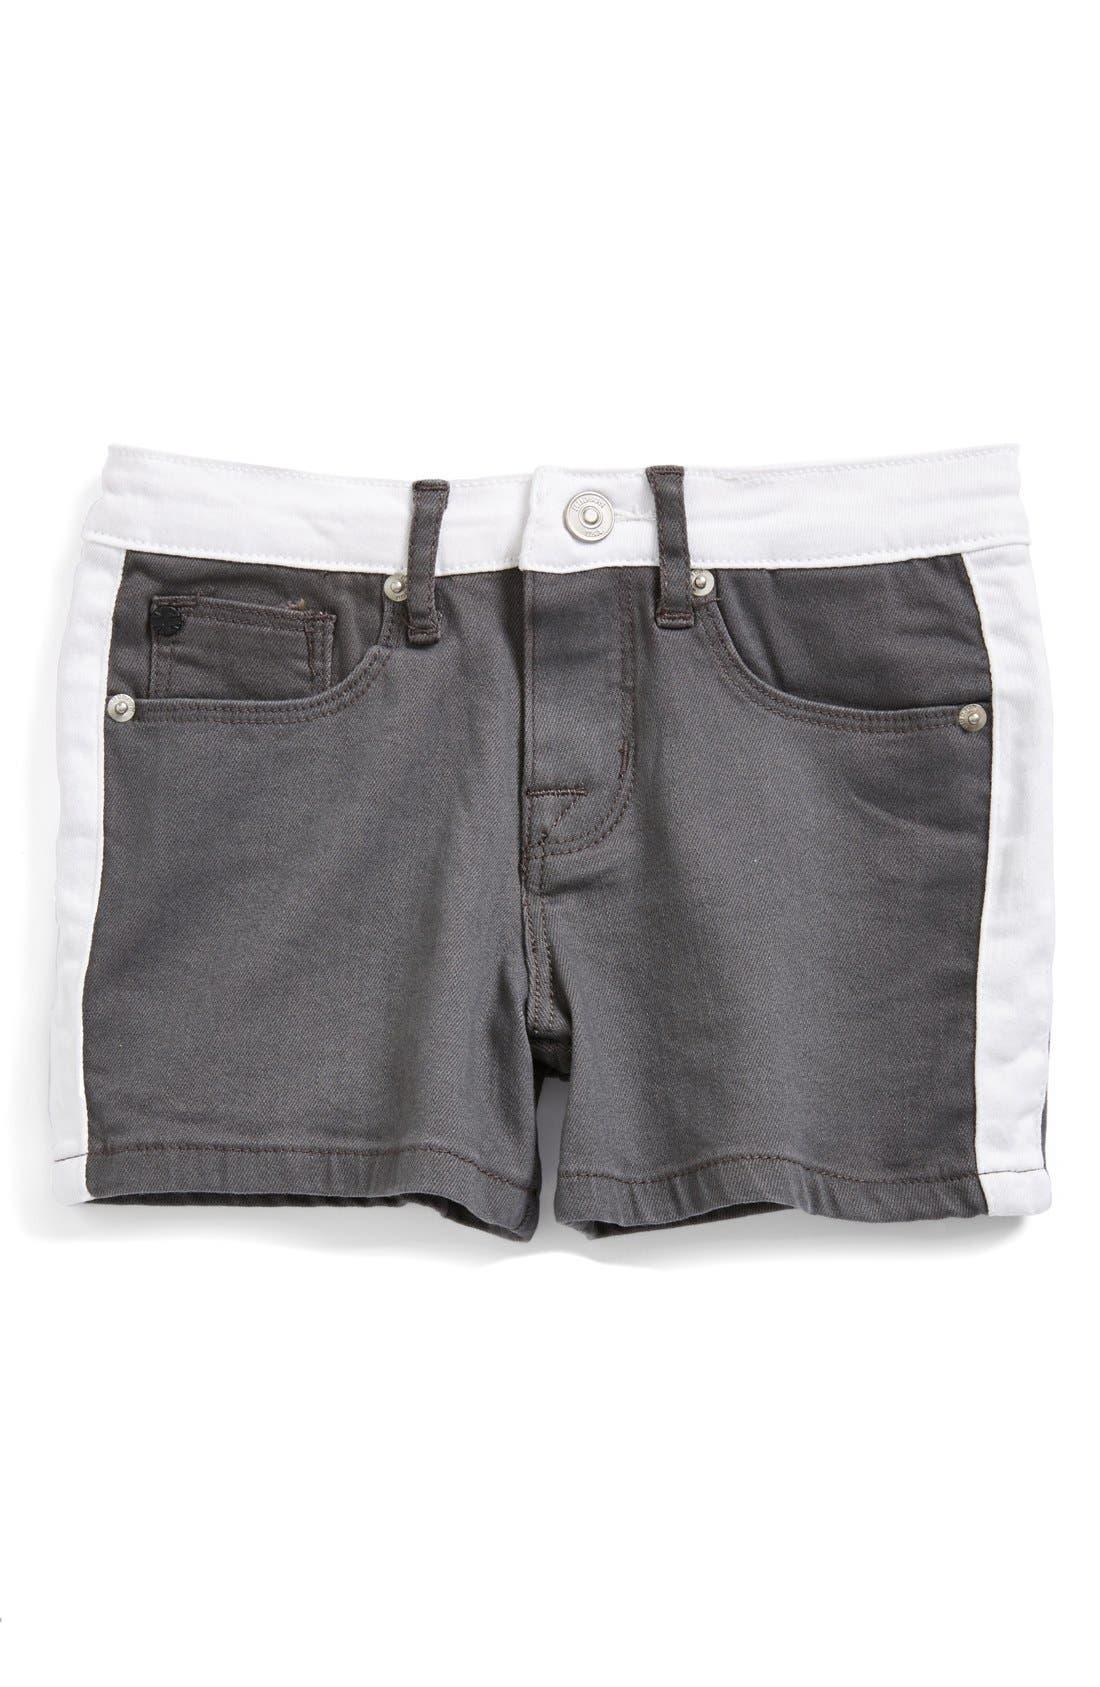 Alternate Image 2  - Hudson Kids 'Leeloo' Shorts (Little Girls & Big Girls)(Online Only)